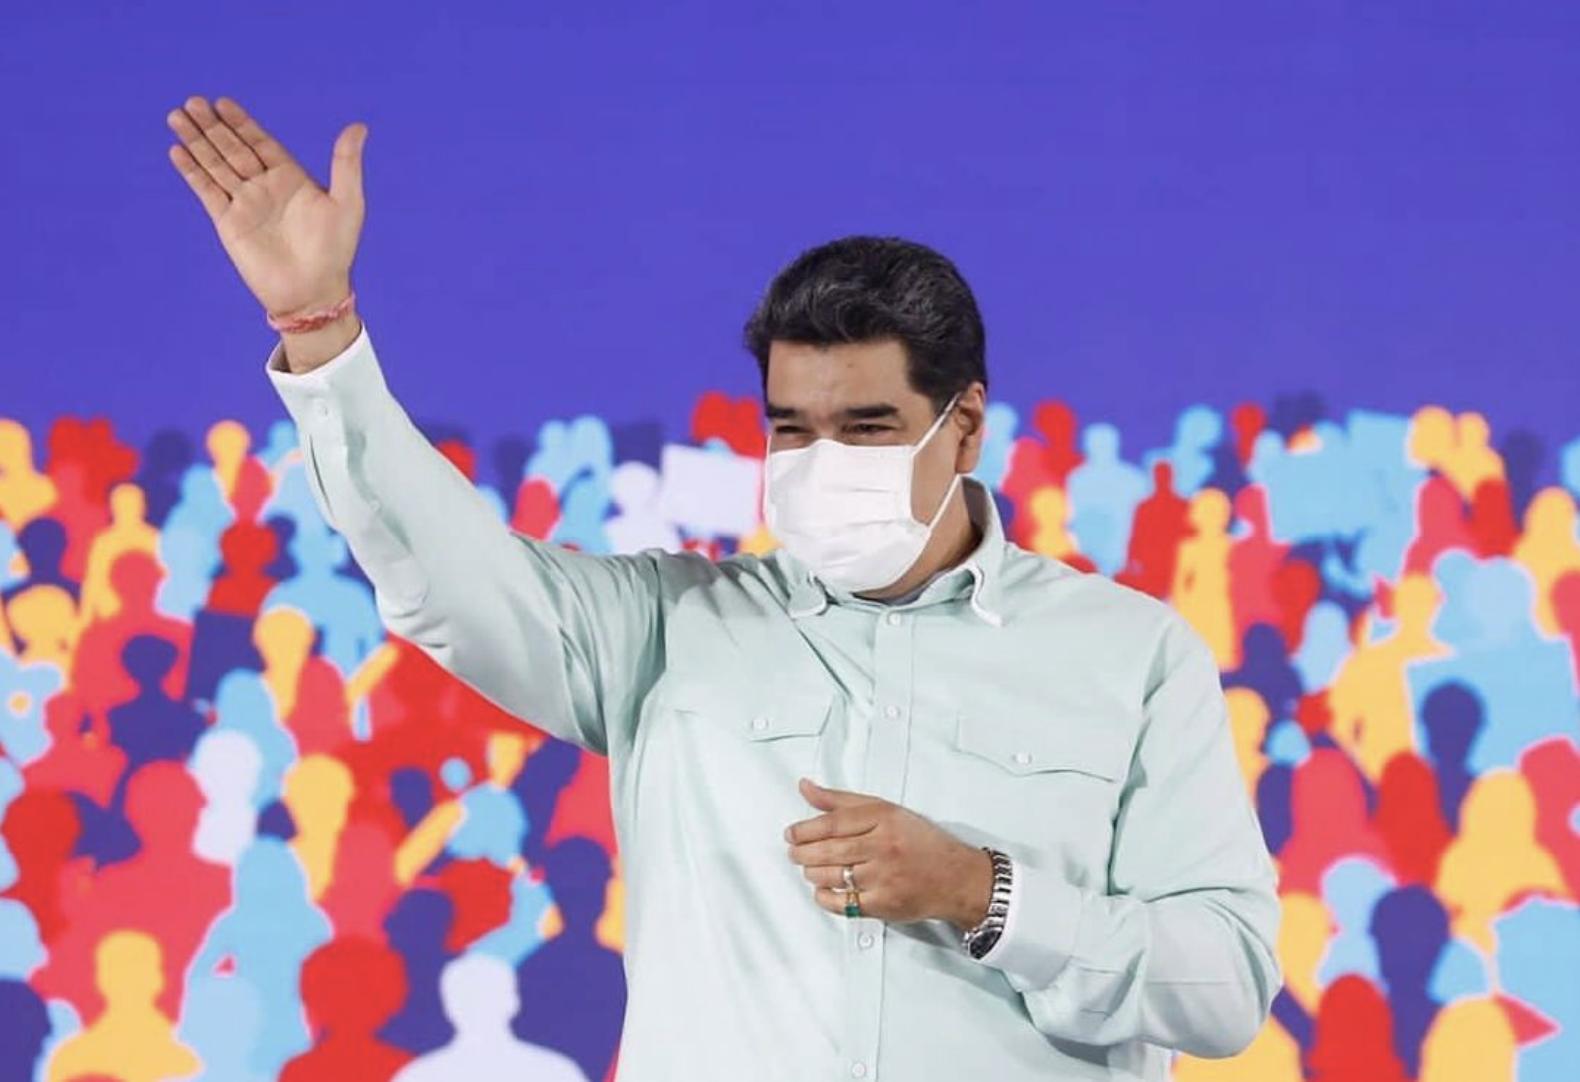 'Maximum Pressure' U.S. Sanctions Questioned as Negotiations With Maduro Regime set to Begin